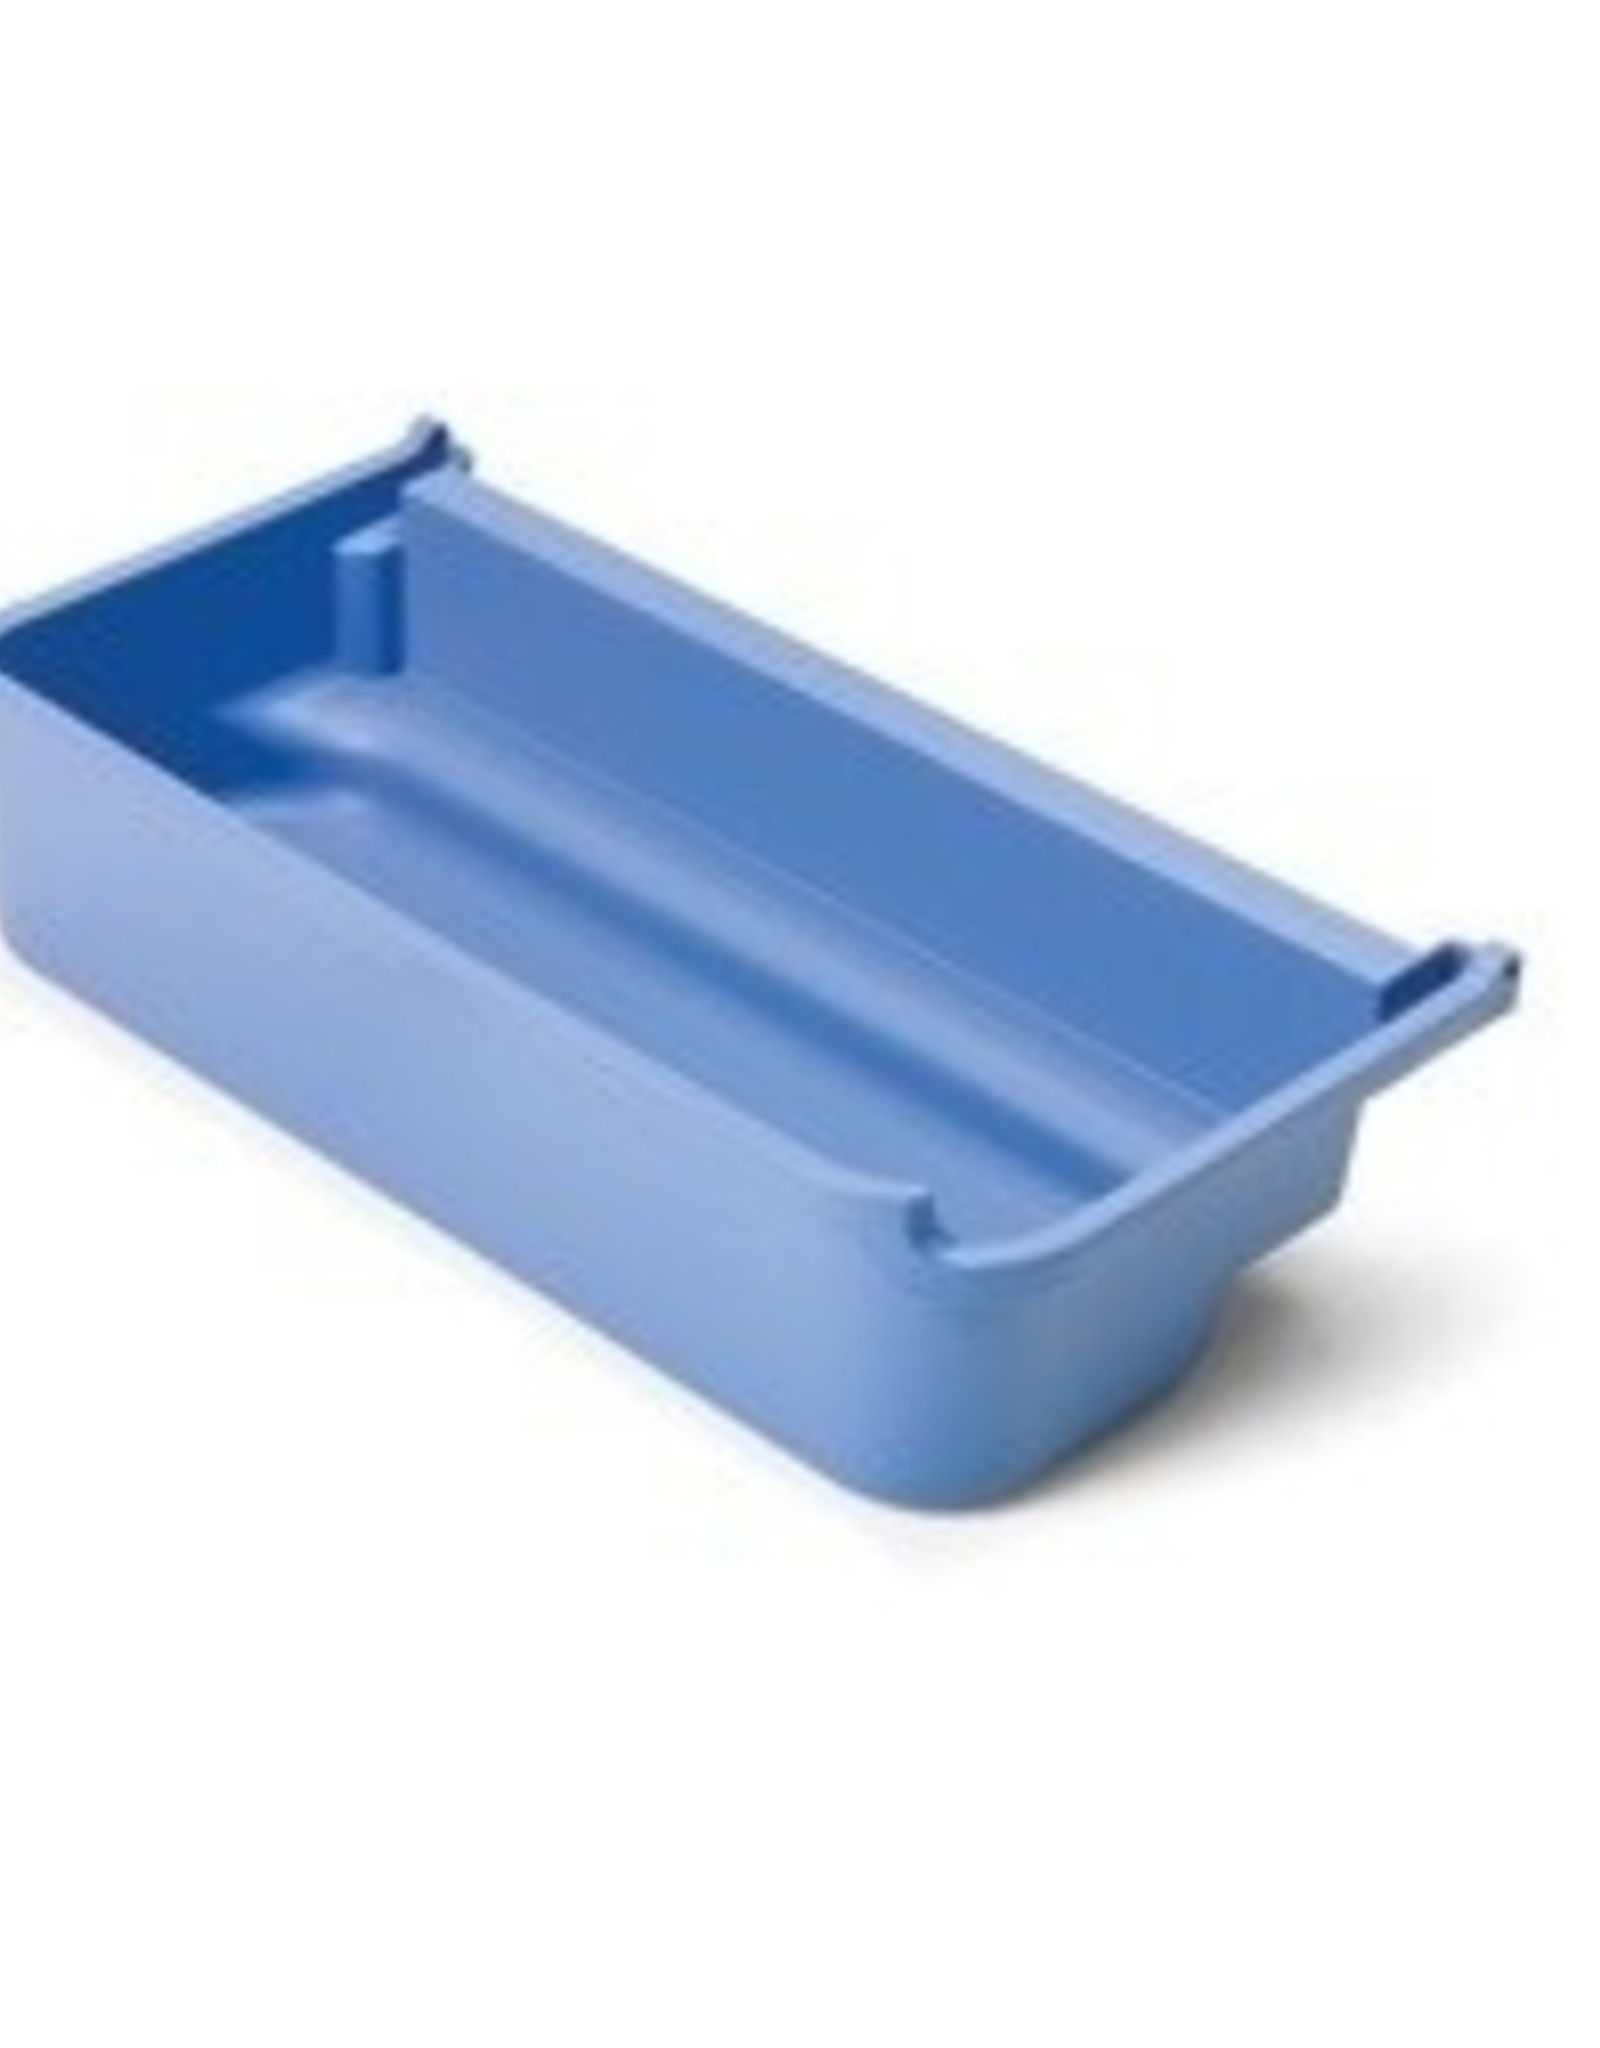 NUMATIC Bagsupport Tray kort blauw